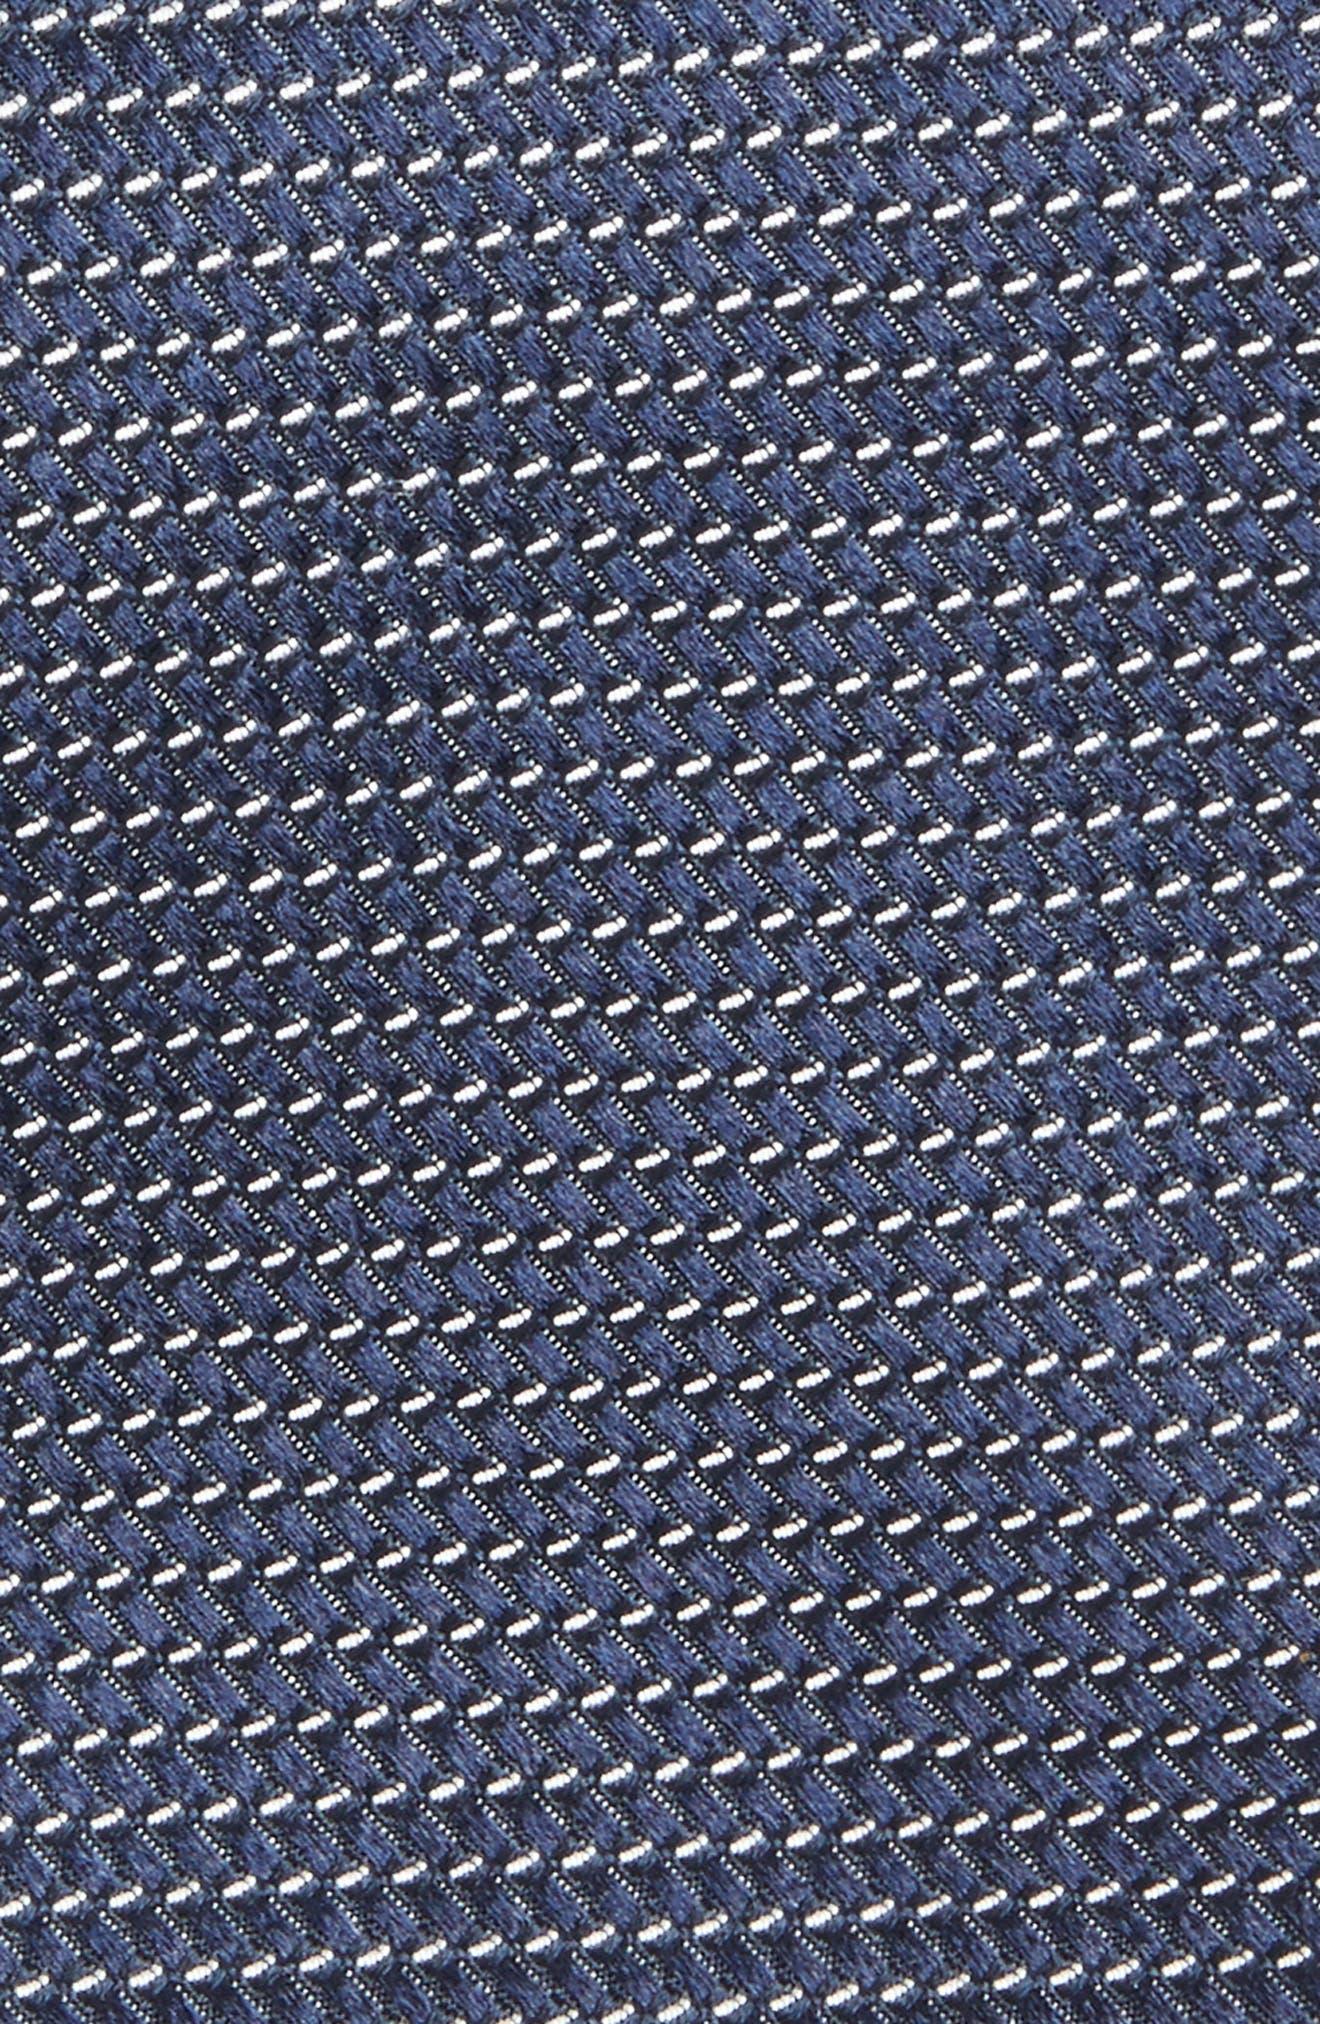 Chiana Mini Silk Tie,                             Alternate thumbnail 2, color,                             410